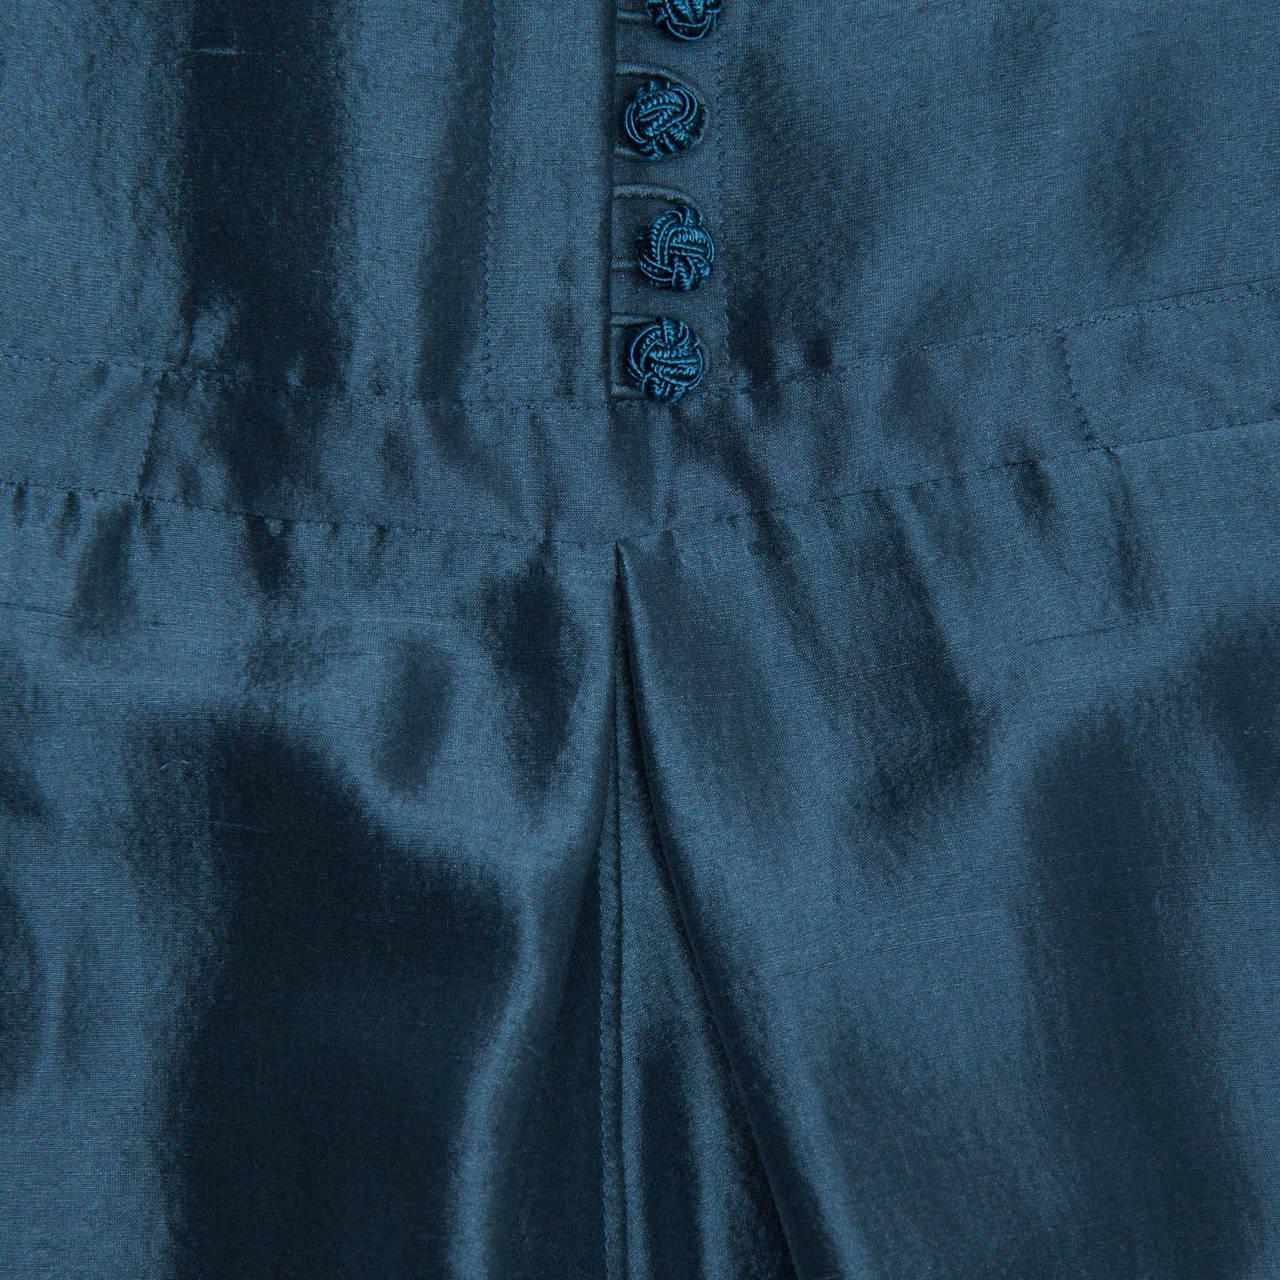 Hermes Silk Teal Tunic Dress 3